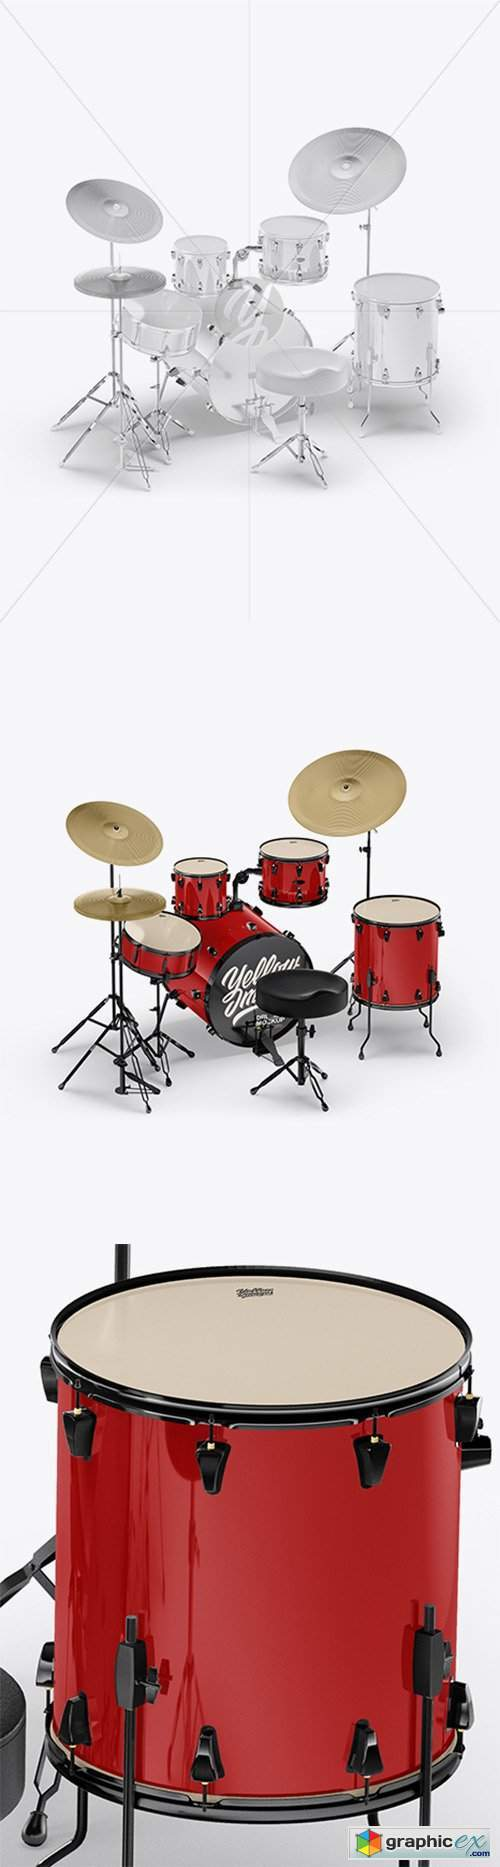 Drum Kit Mockup - Back Half Side View (High-Angle Shot)